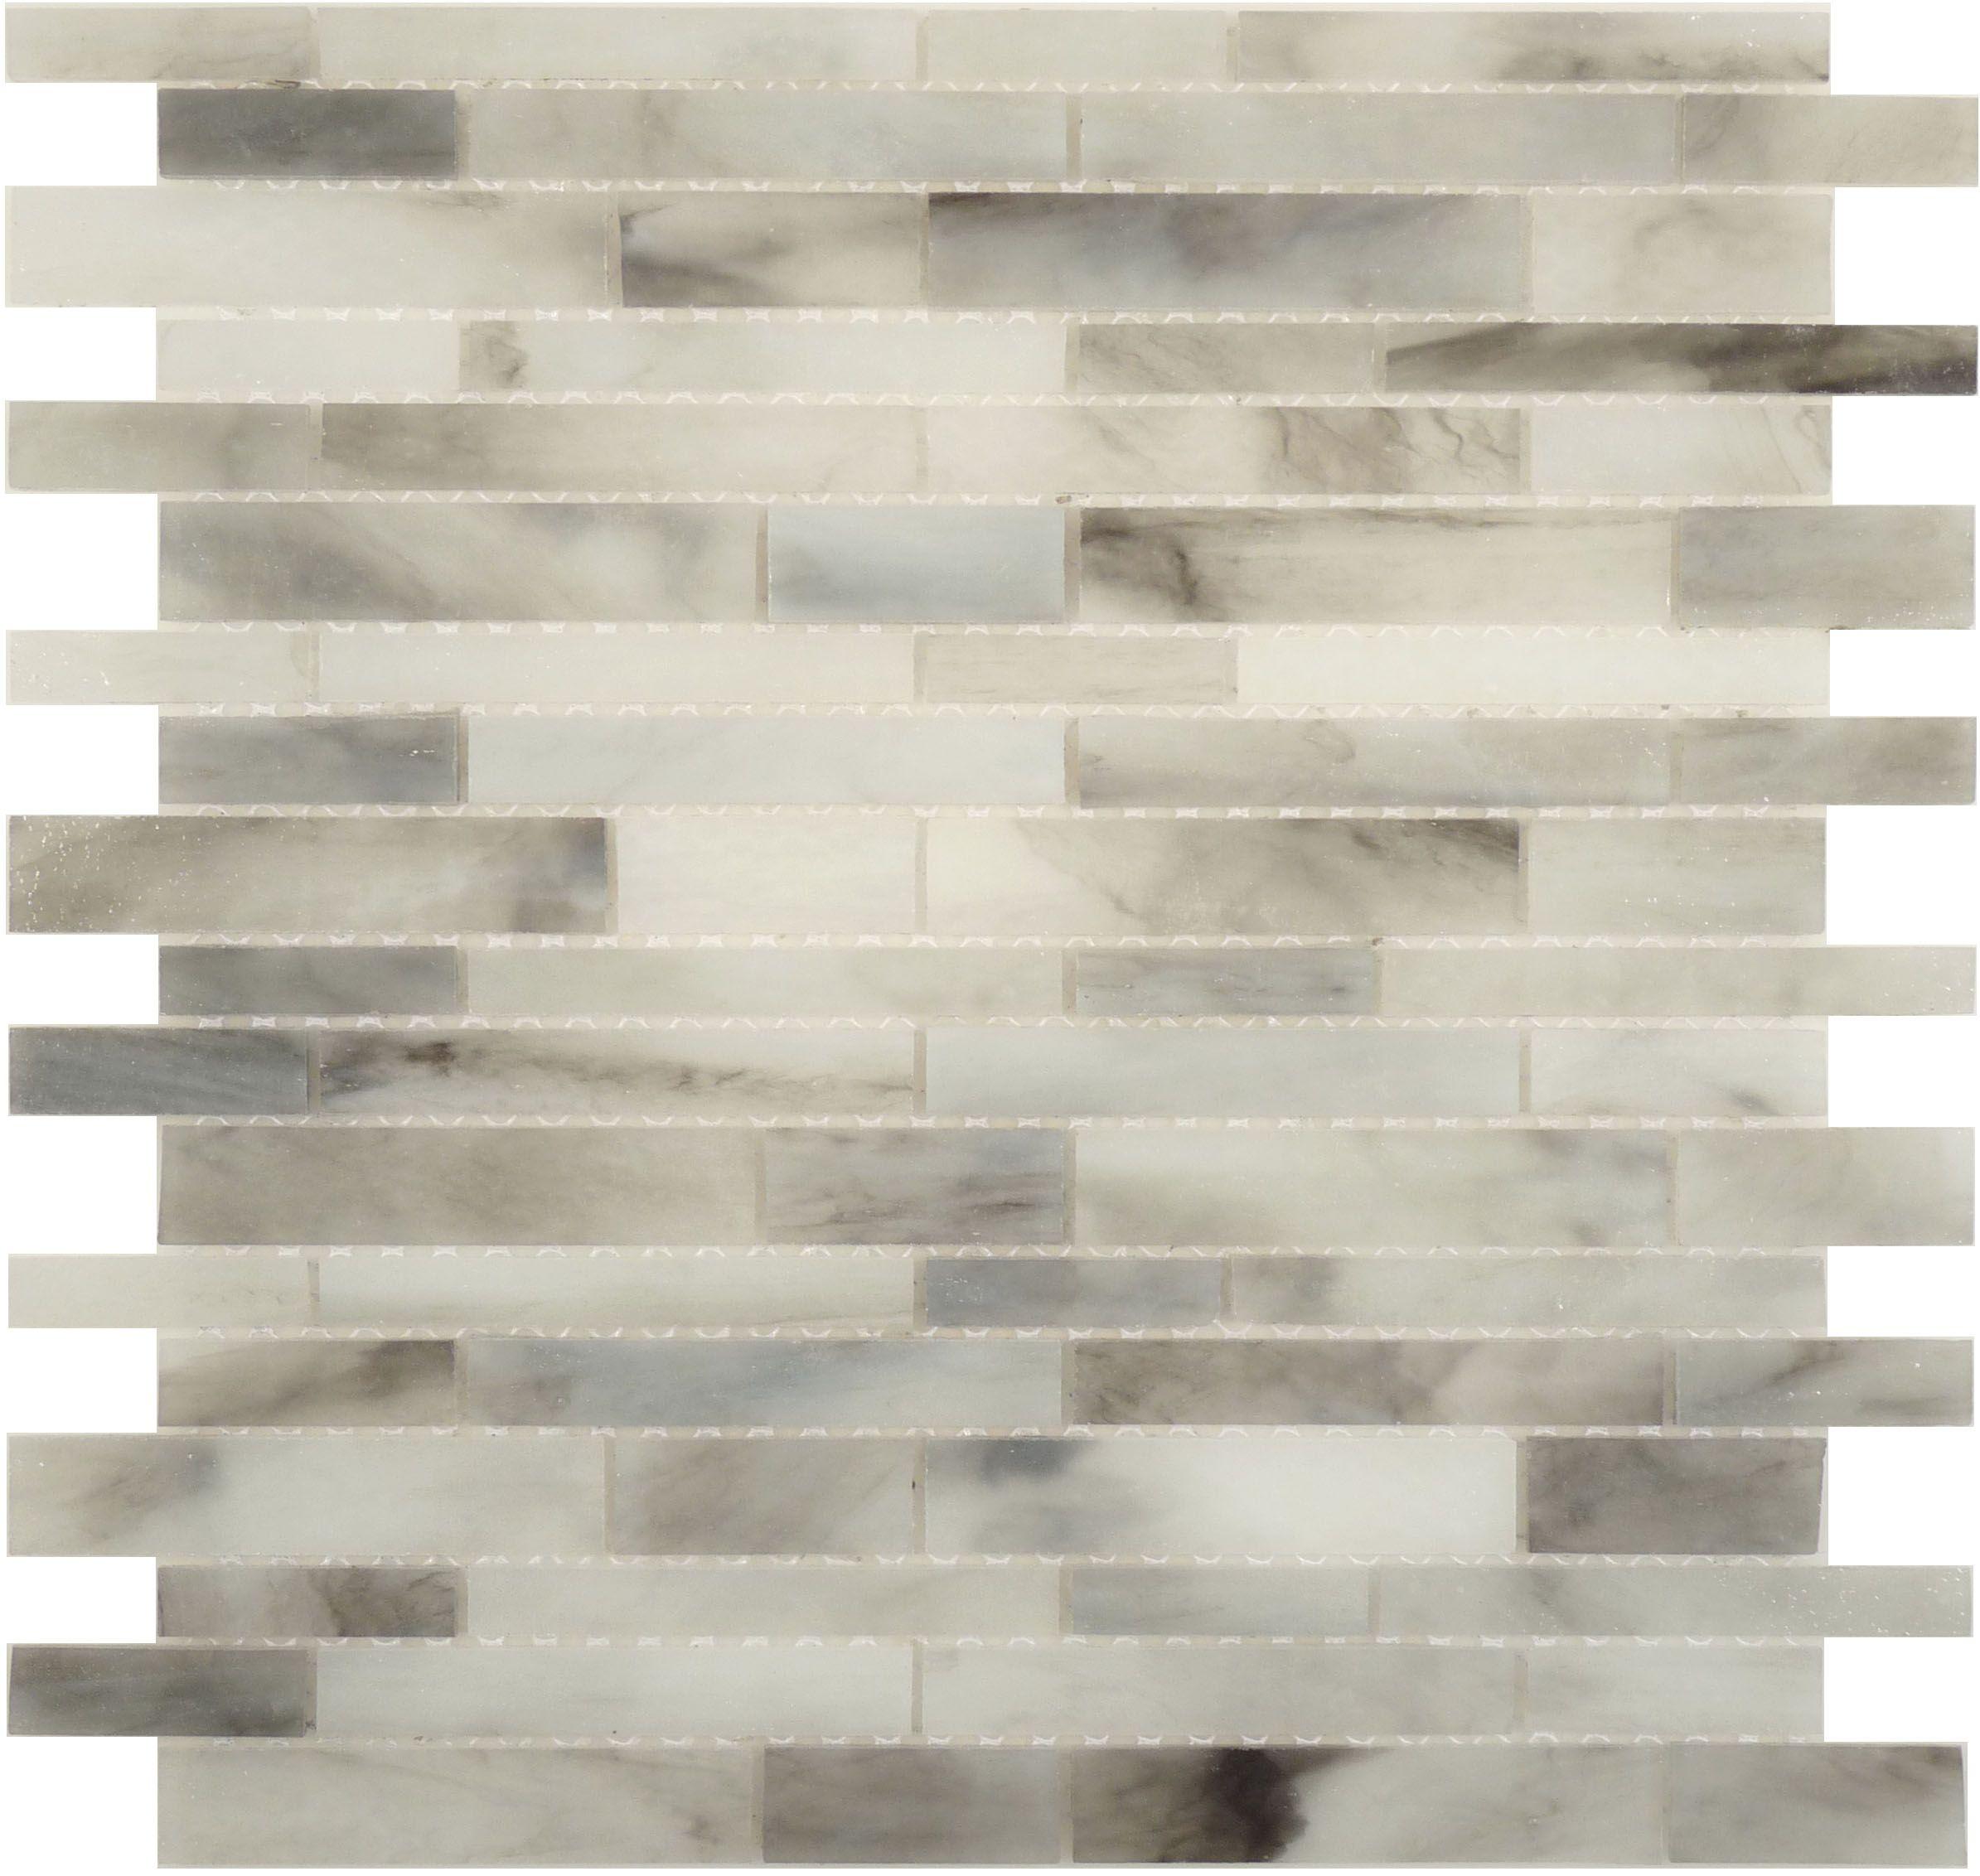 Botanical Glass Murano Vena Glass Mosaic Random Bricks Light Gray Glossy Grey